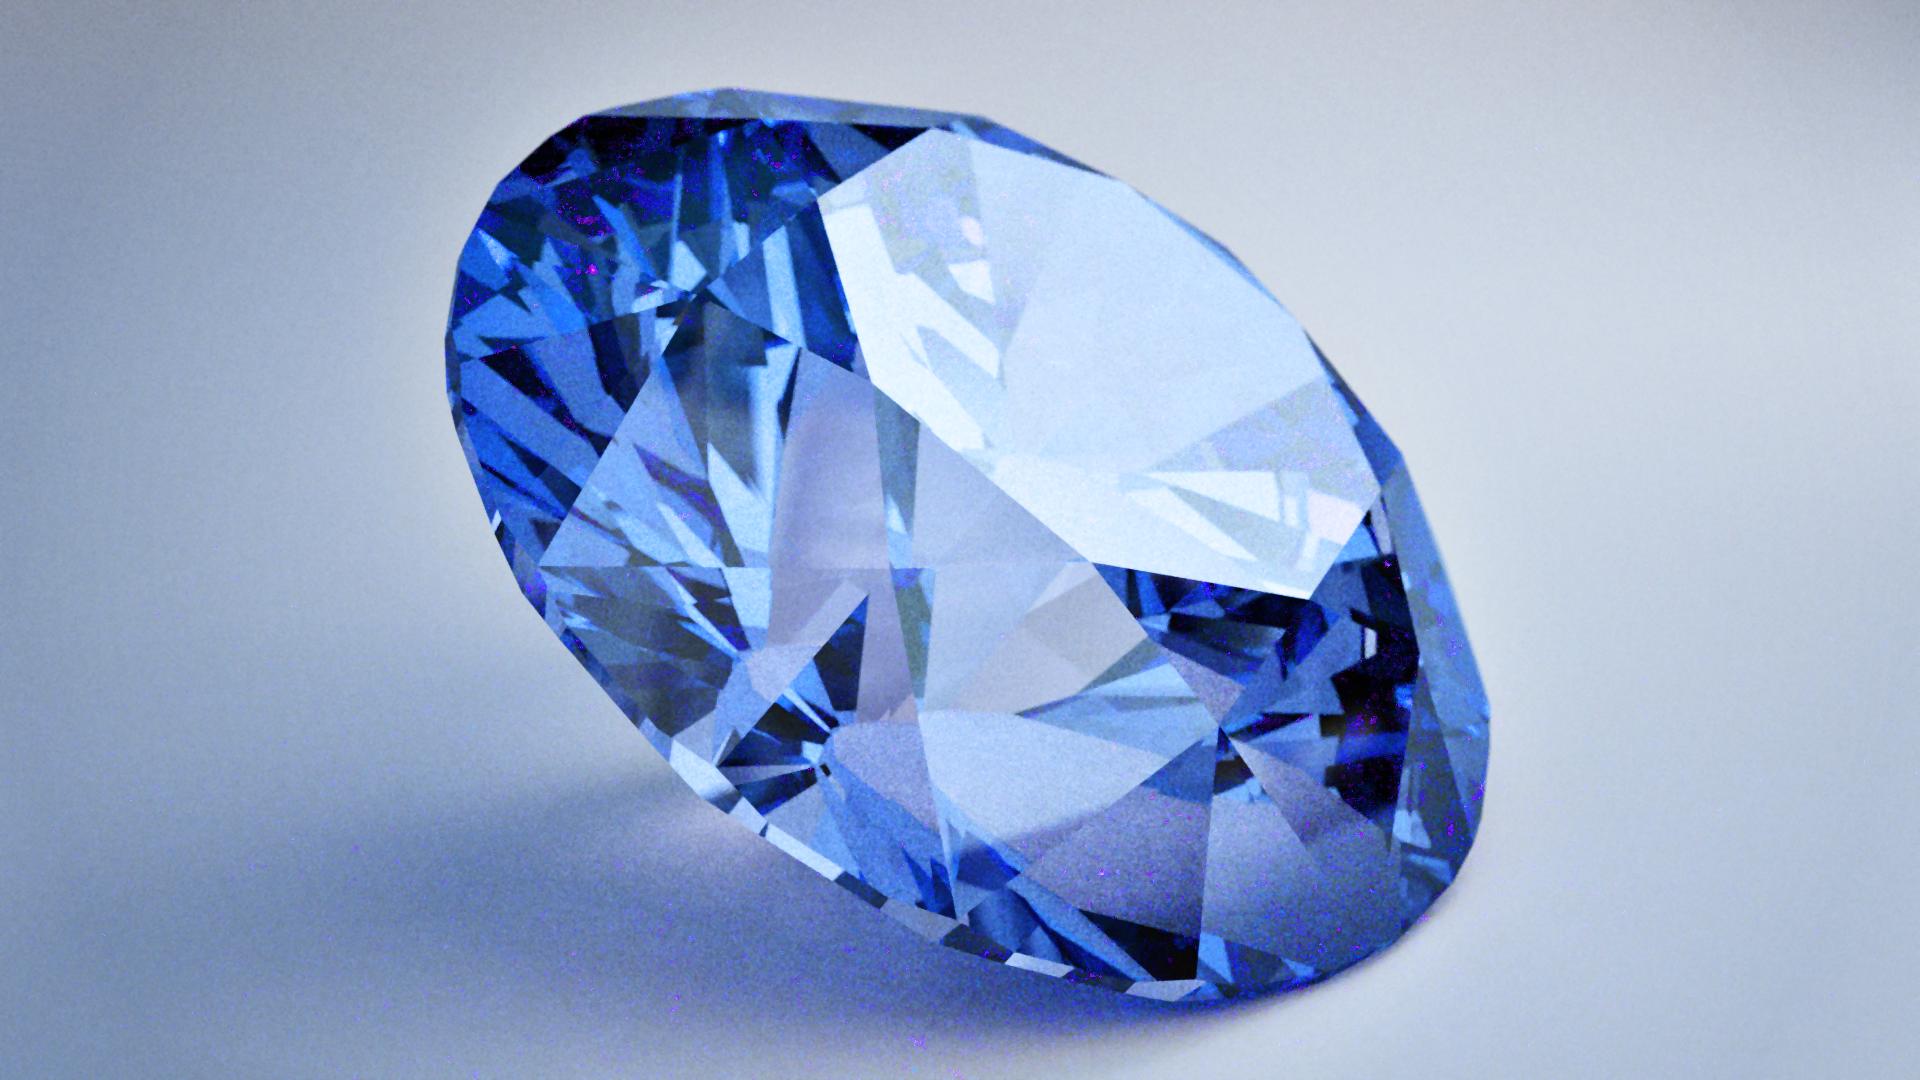 Blue Diamond By Inobelar D3ipkew Png 1920 1080 Blue Diamond Almond Milk Blue Diamond Almonds Blue Diamond